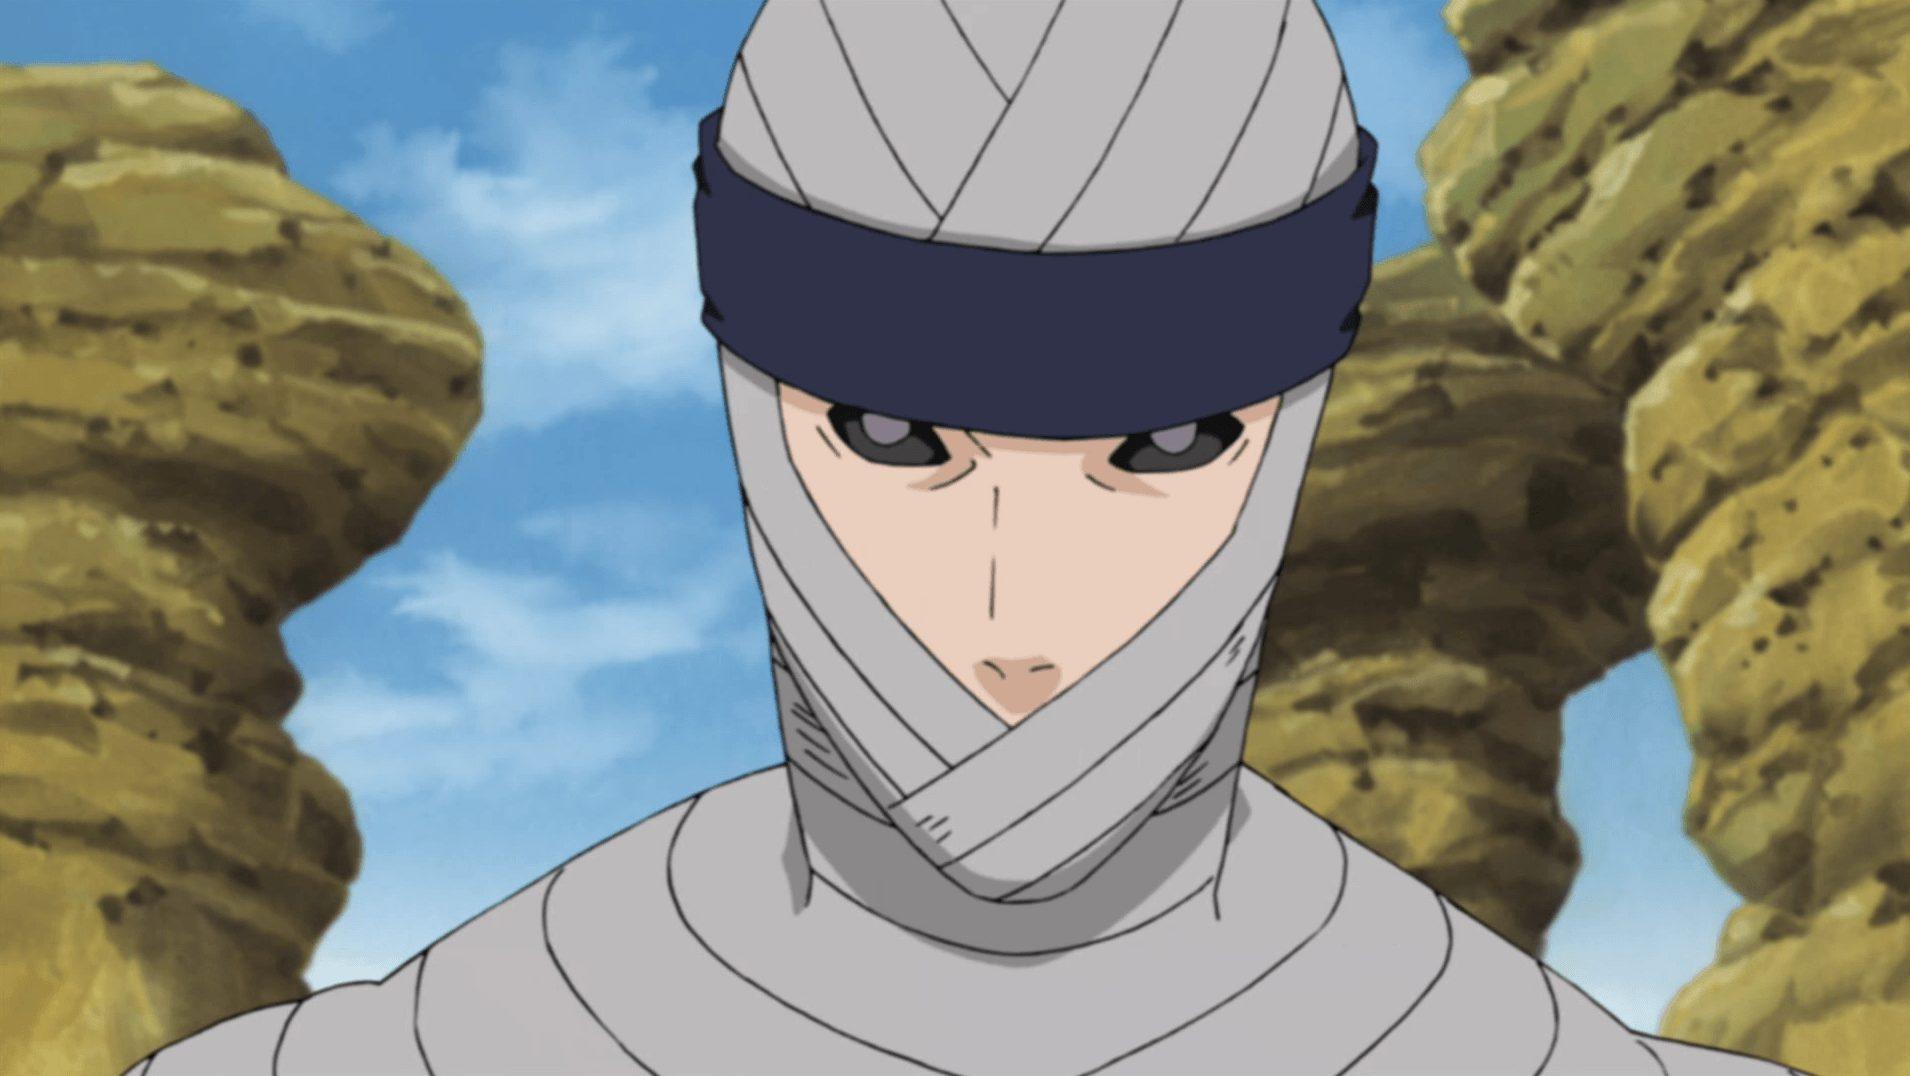 10 Shinobi Edo Tensei Terkuat di Anime Naruto 5